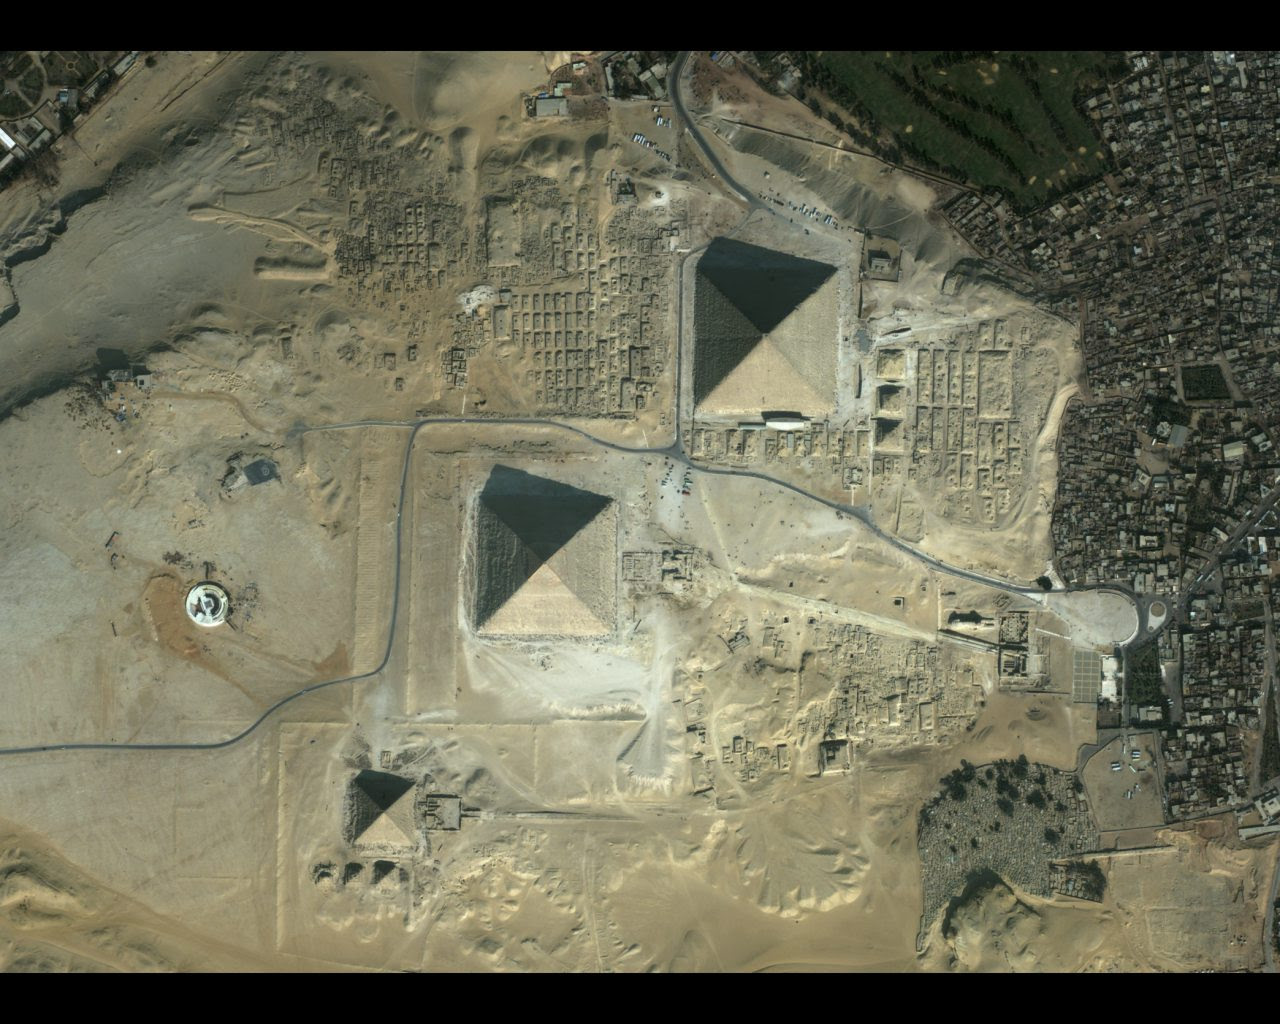 egypt_pyramids_2002_ikonoswall